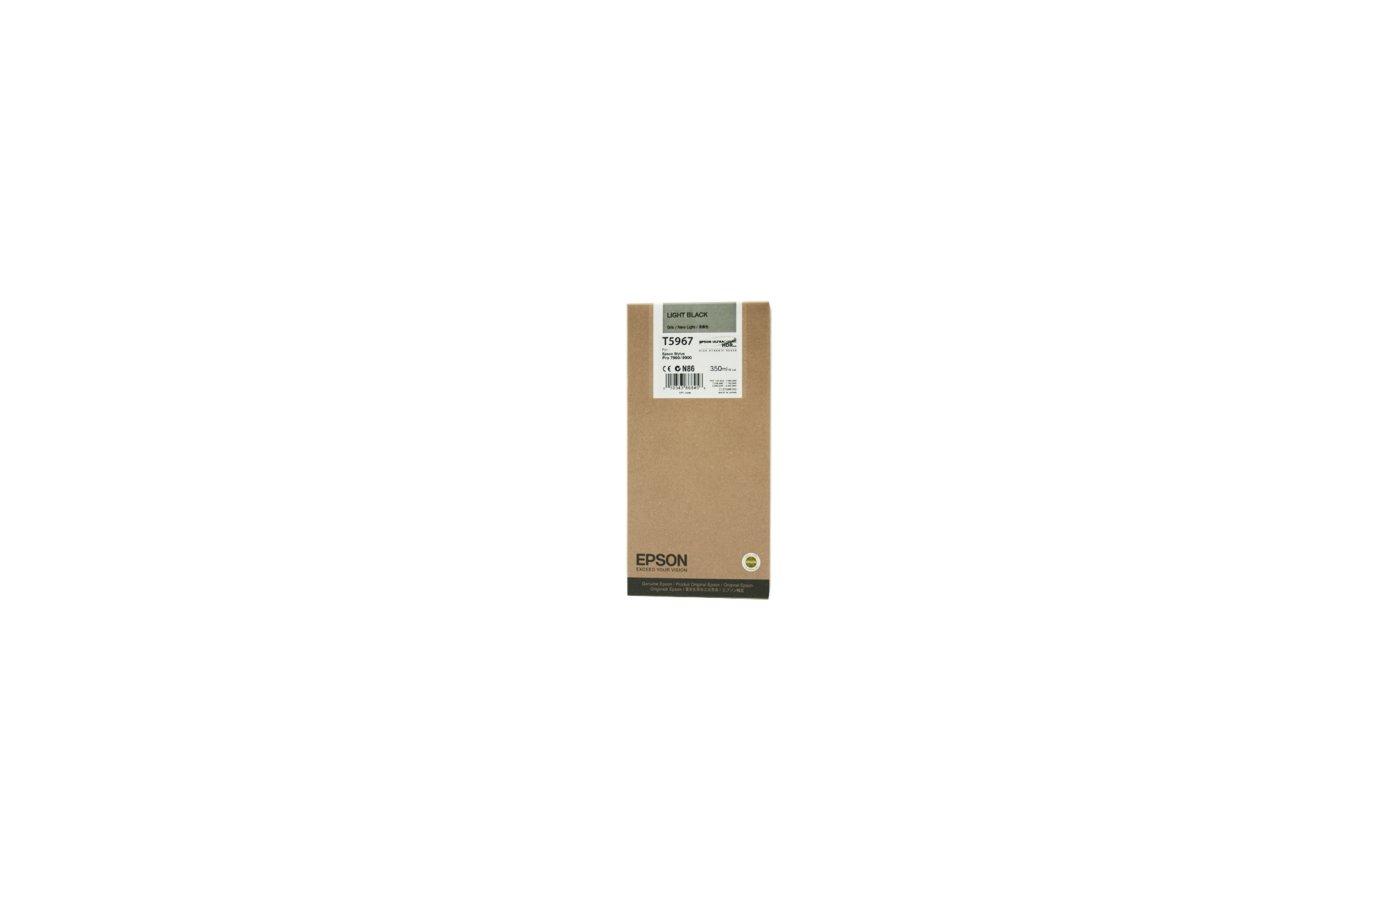 Картридж струйный Epson C13T596700 картридж (Light Black для Stylus PRO 7900/9900 (350ml) (серый))